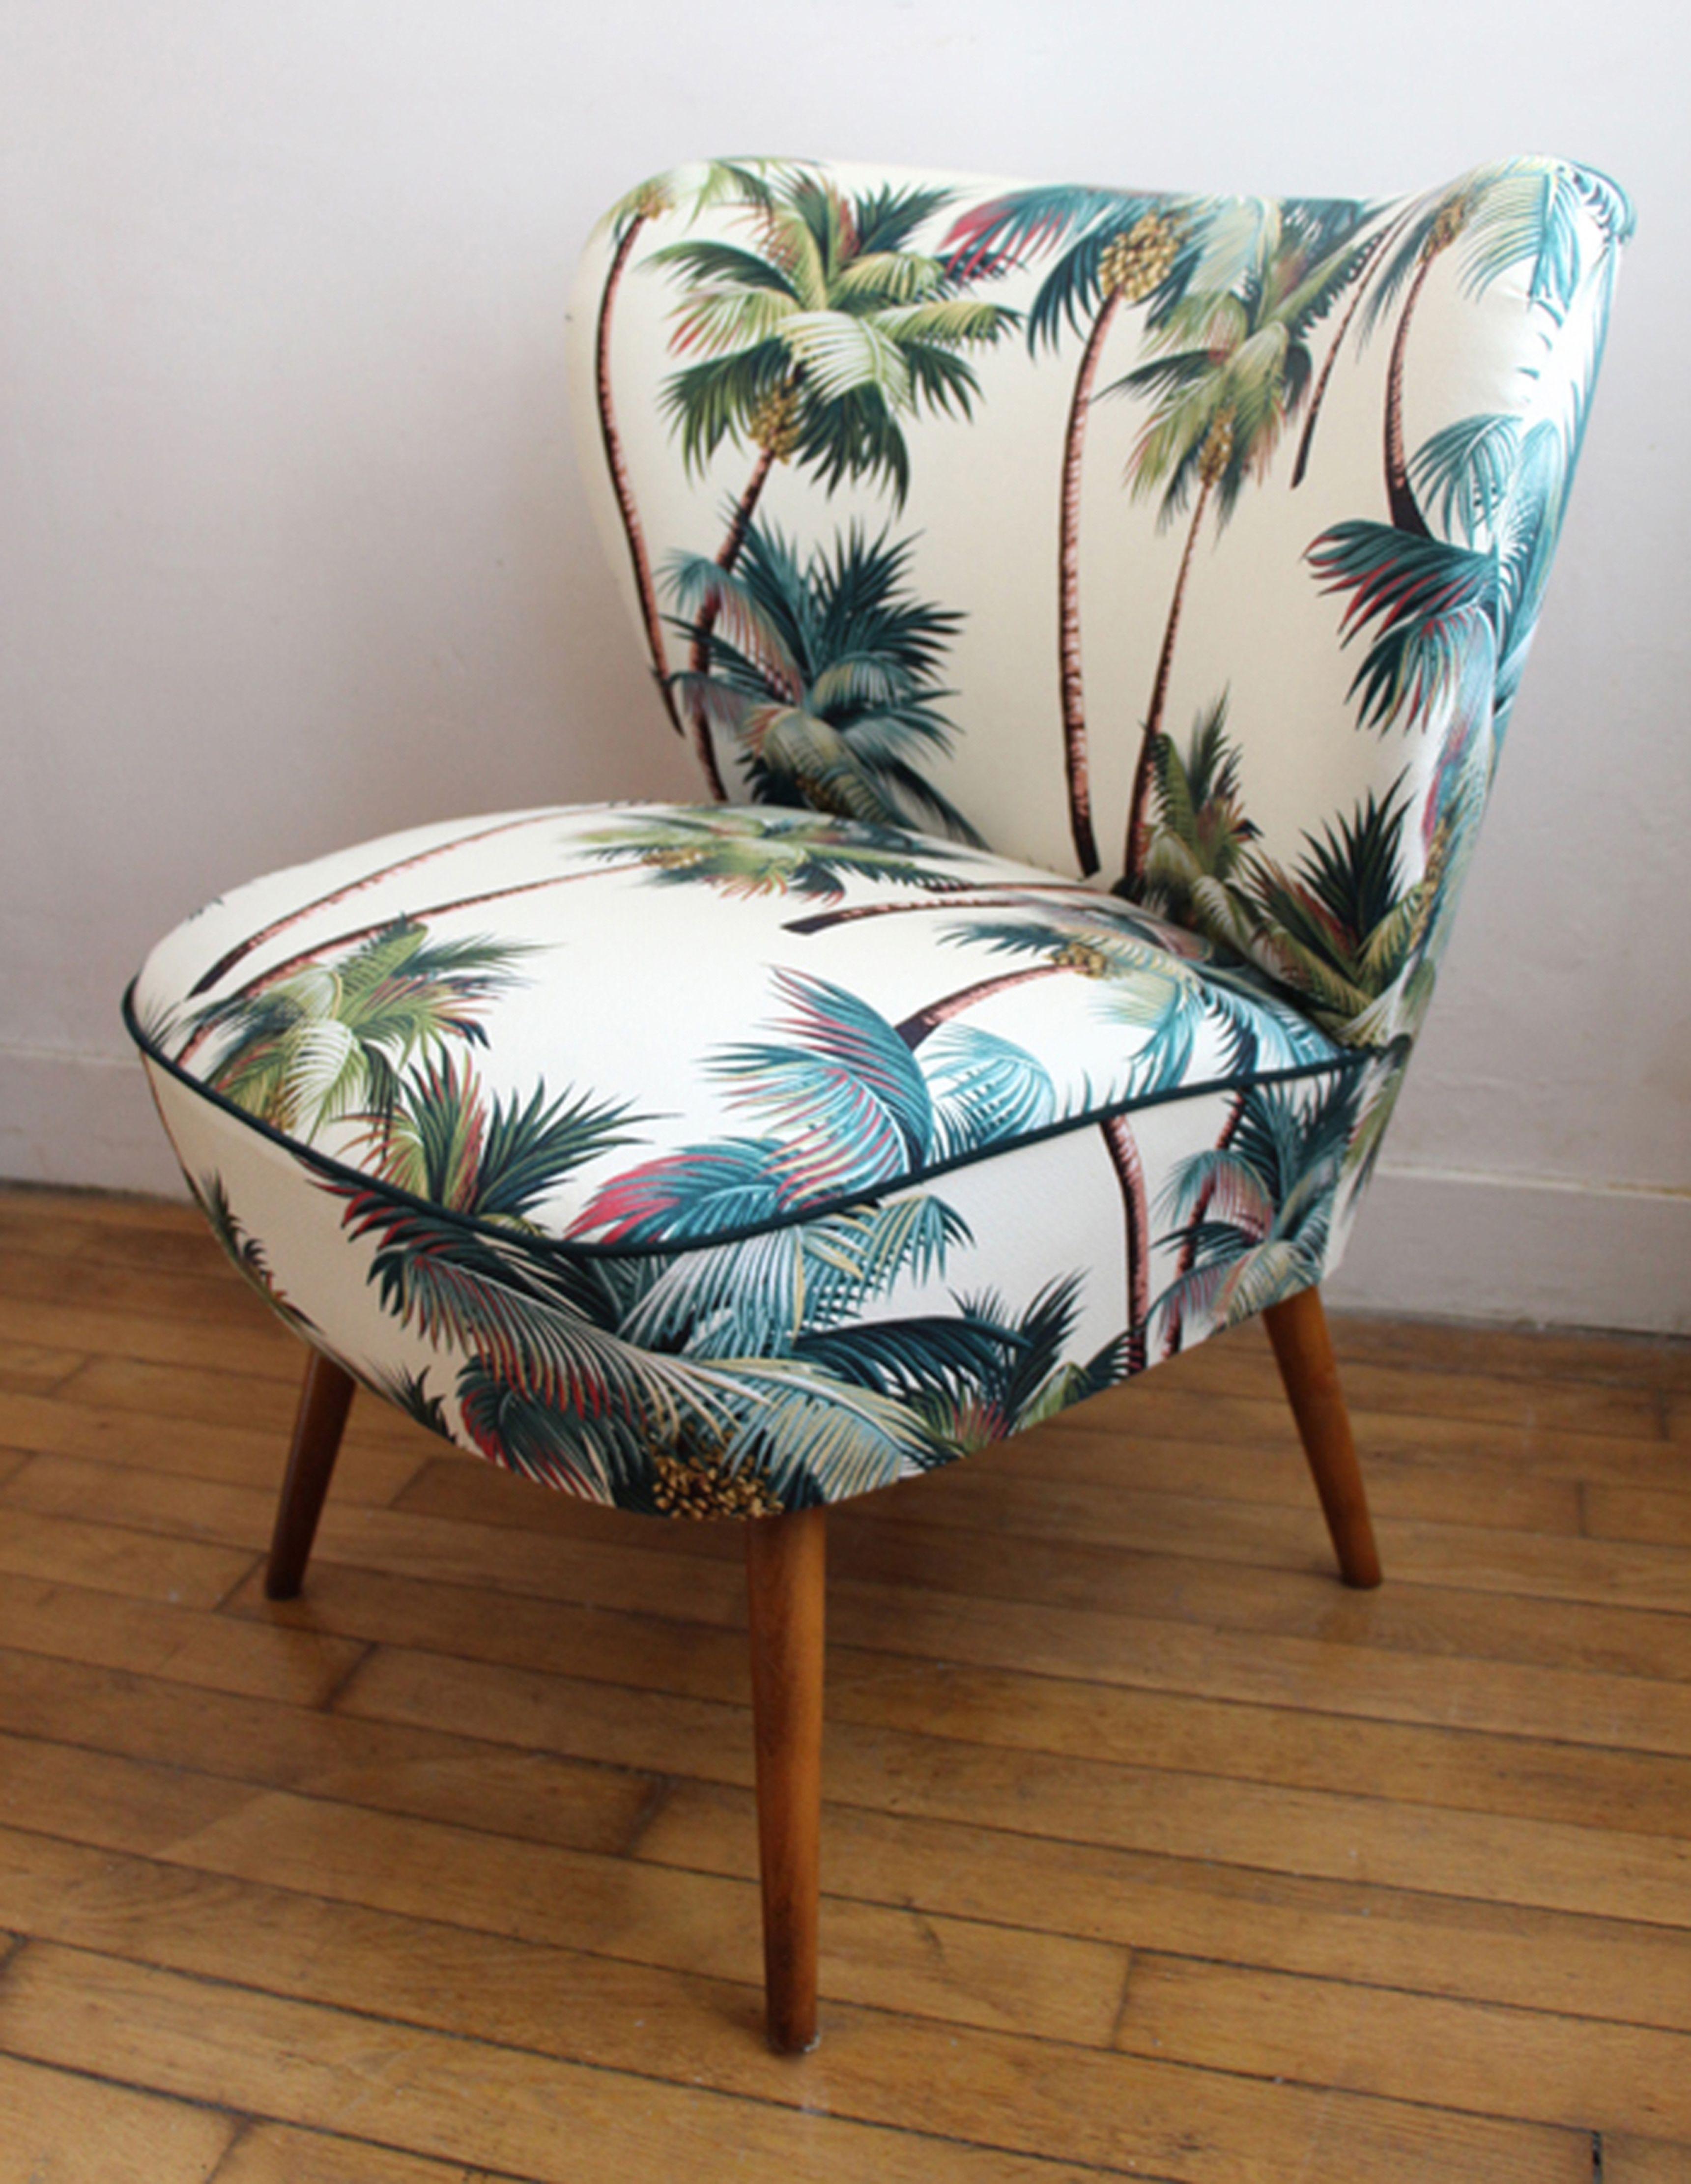 palm tree upholstery fabric sold by hawaiianfabricnbyond etsy com rh pinterest com